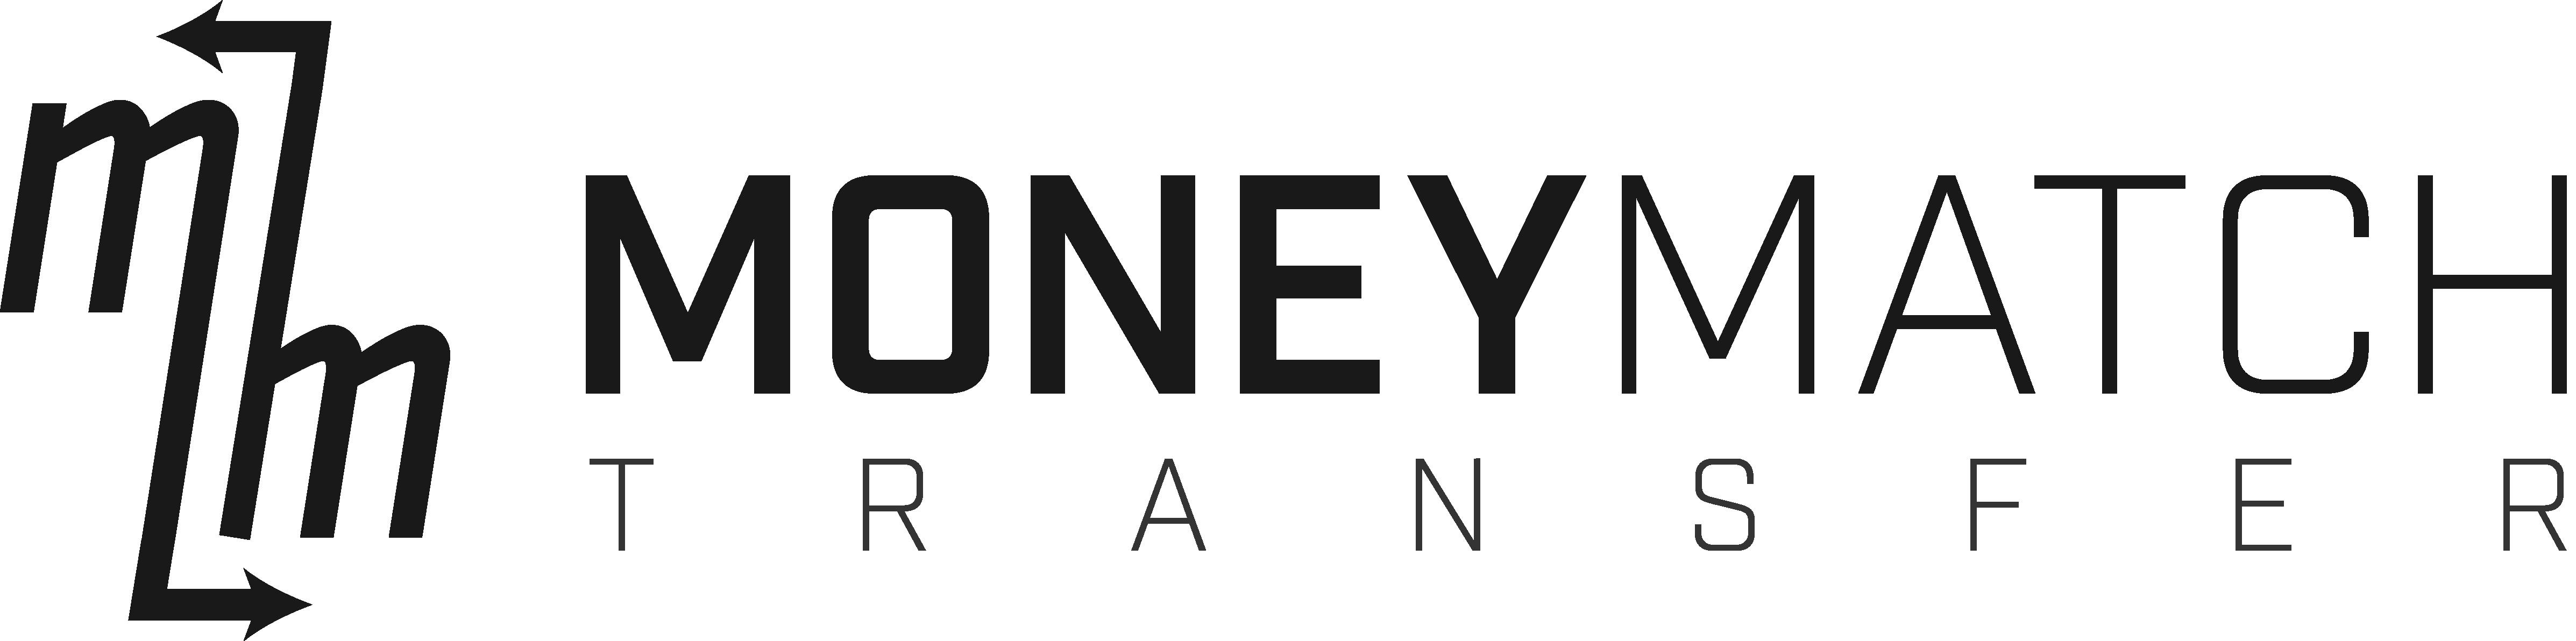 Transfer Process Moneymatch Wiring Money To South Korea Send Feedback